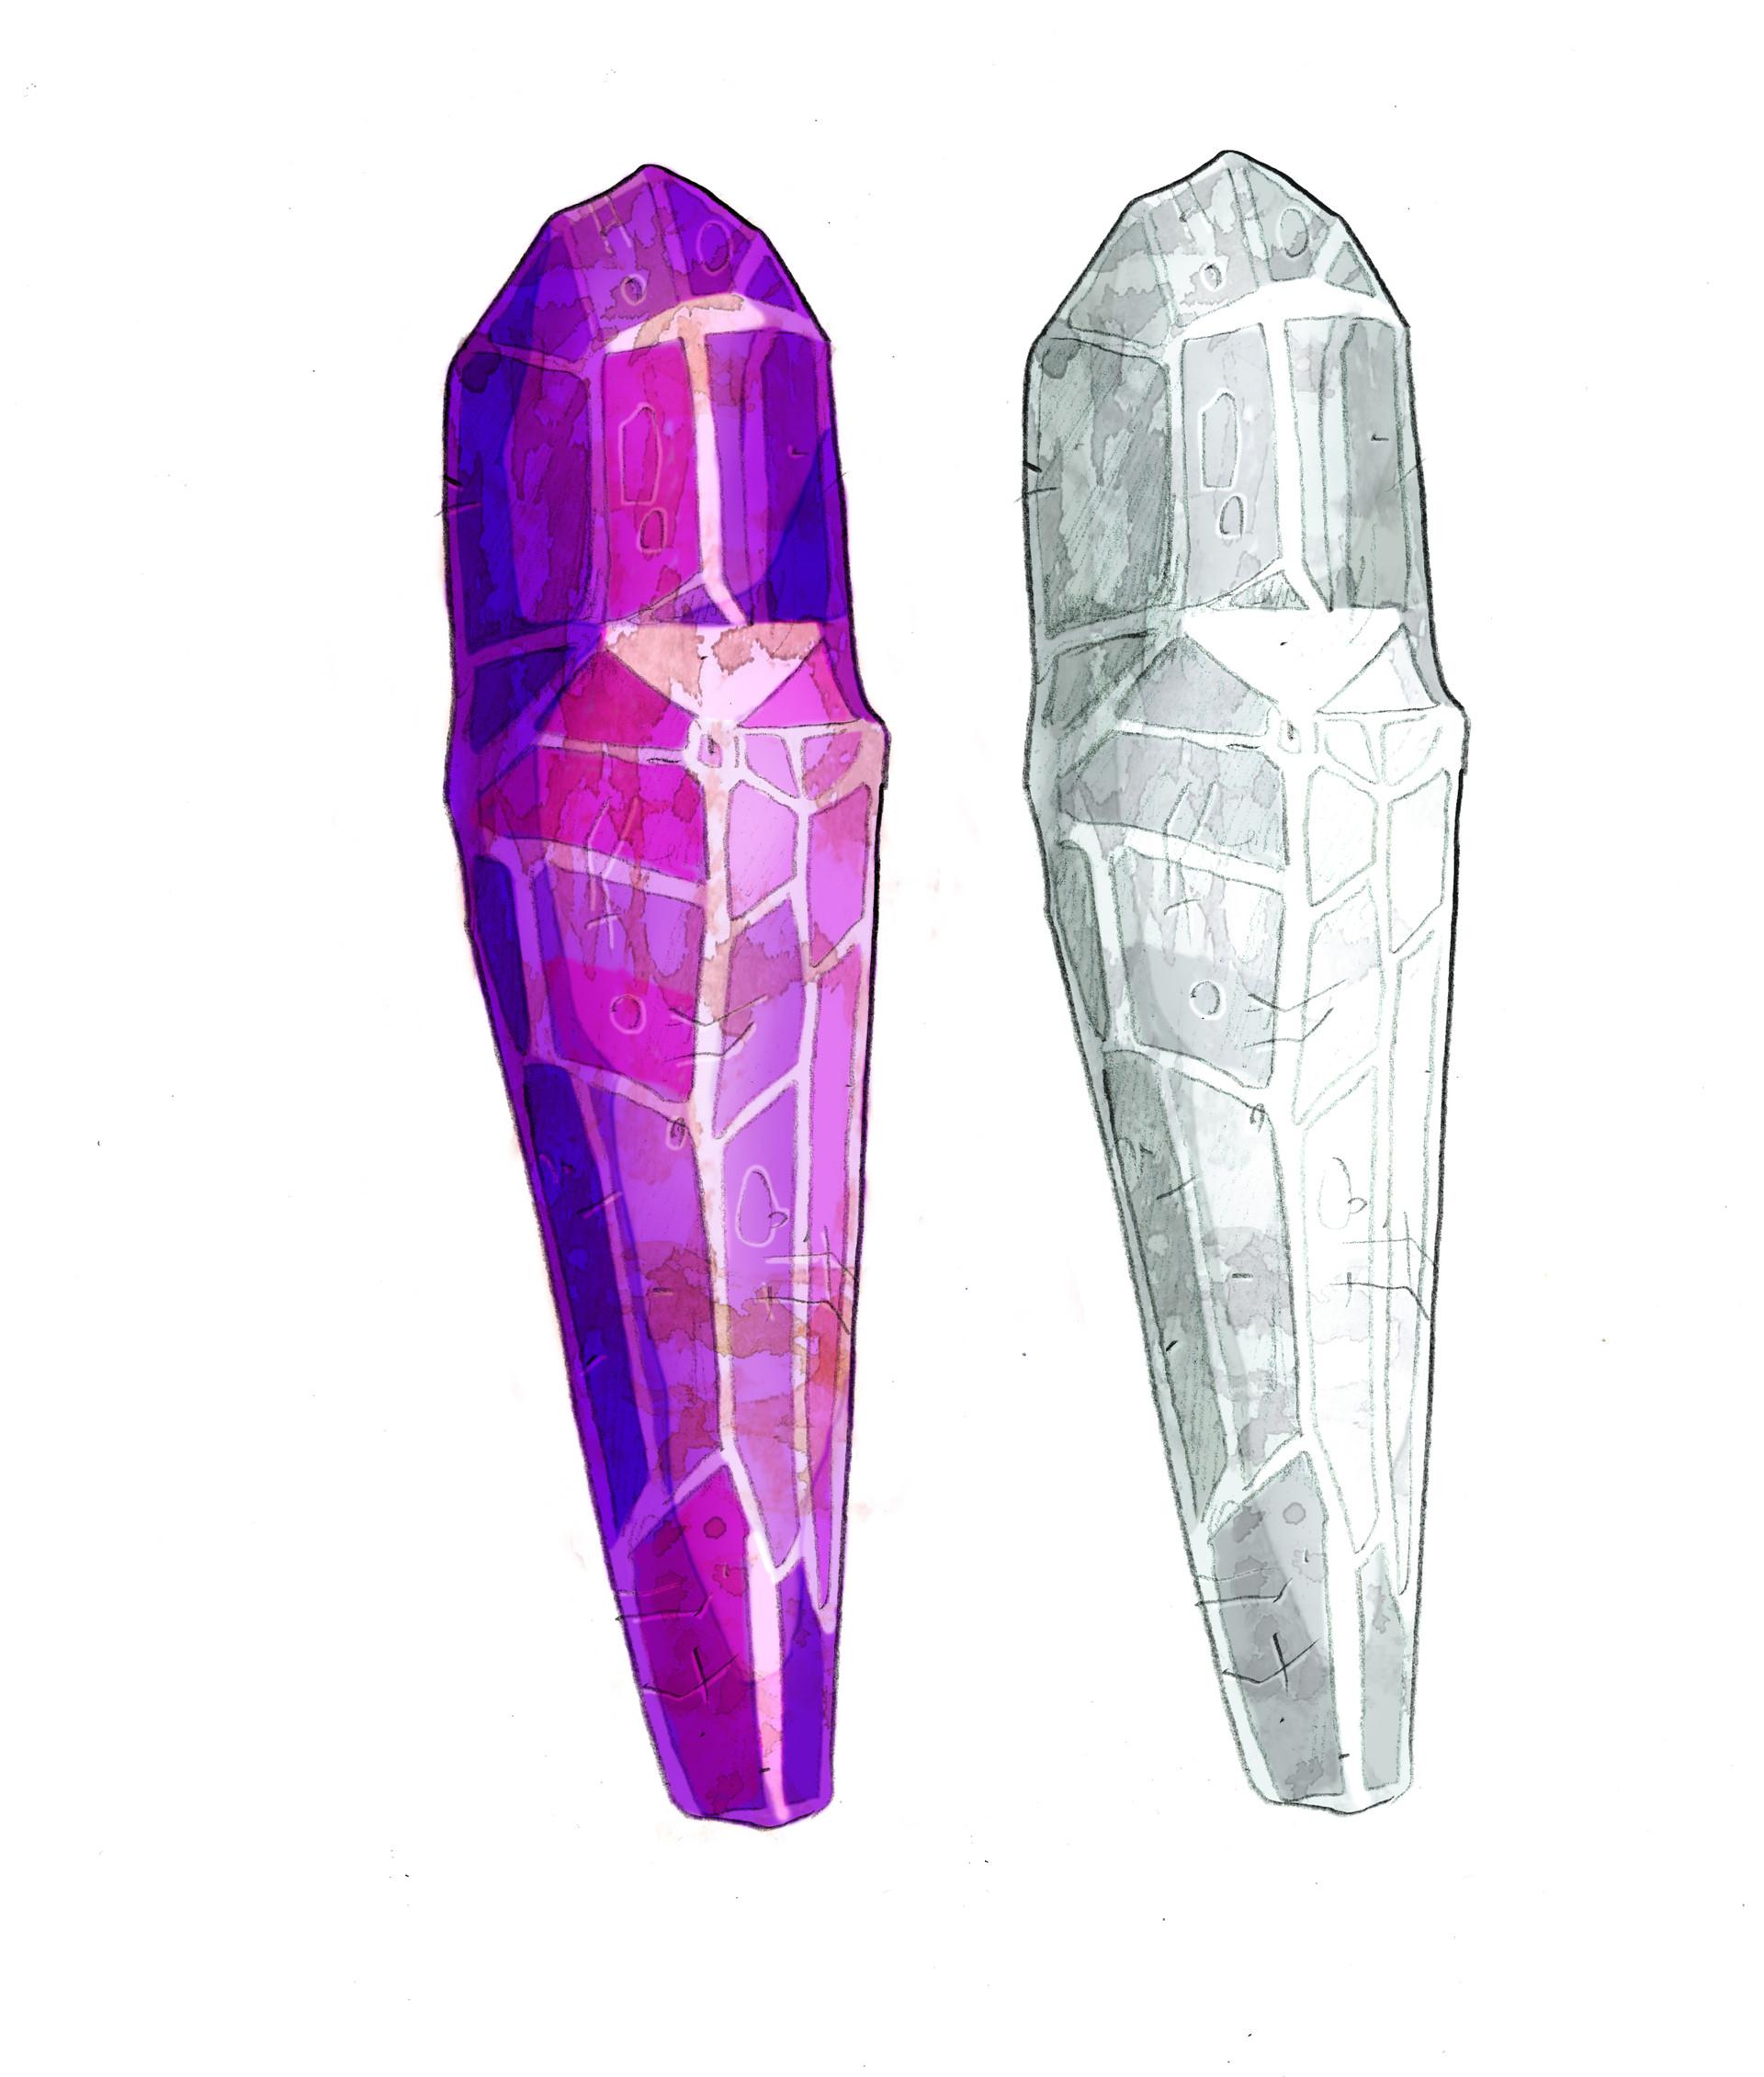 the dark crystal shard